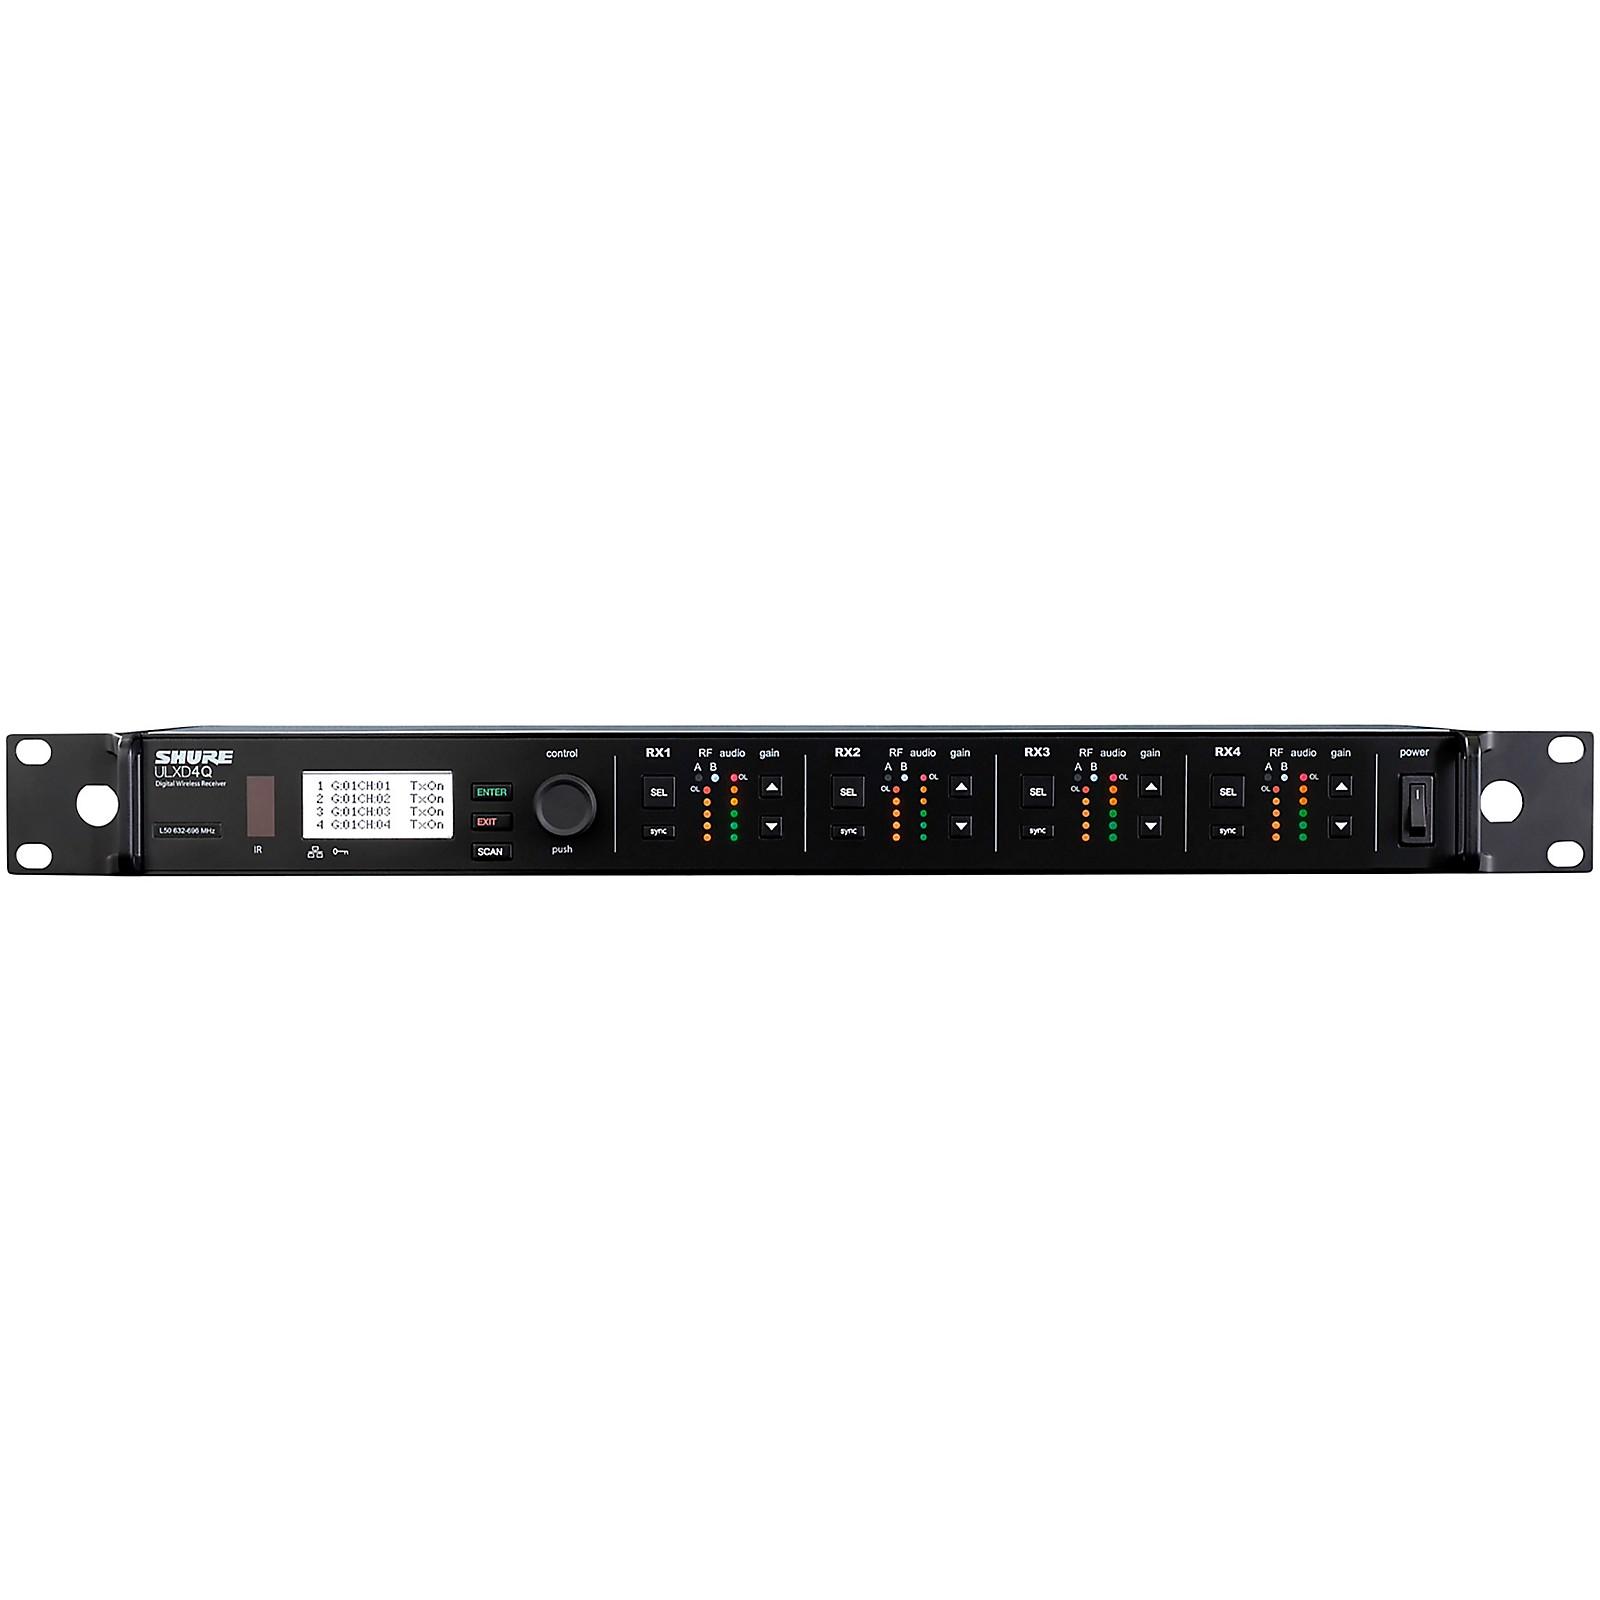 Shure ULXD4Q Four-Channel Digital Wireless Receiver